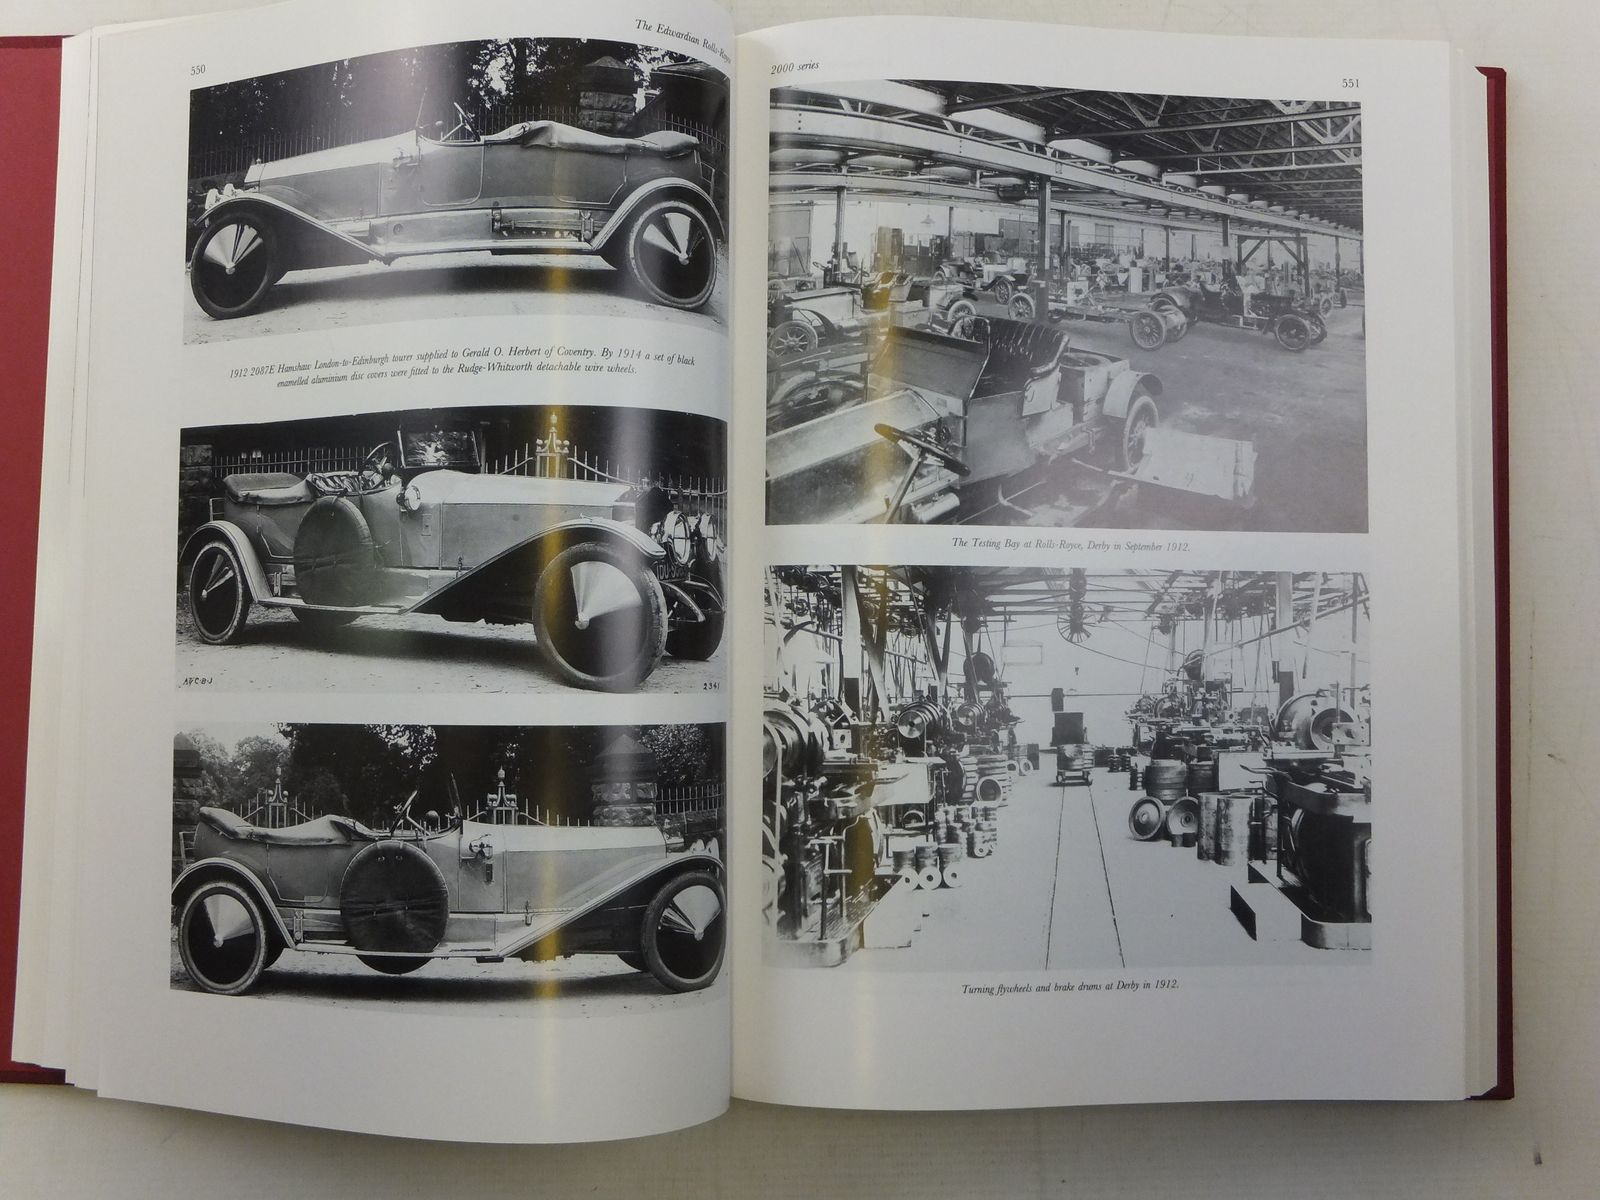 Photo of THE EDWARDIAN ROLLS-ROYCE TWO VOLUMES written by Fasal, John M. Goodman, Bryan Clarke, Tom published by John Fasal (STOCK CODE: 1607812)  for sale by Stella & Rose's Books